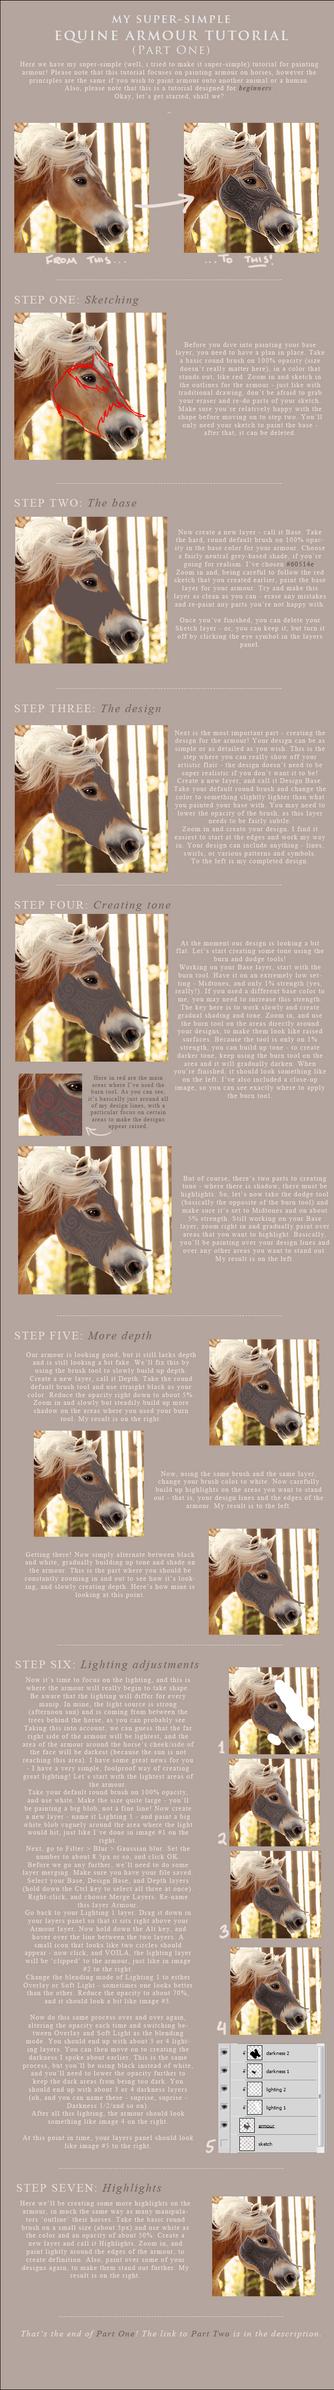 Equine Armour Tutorial - PART ONE